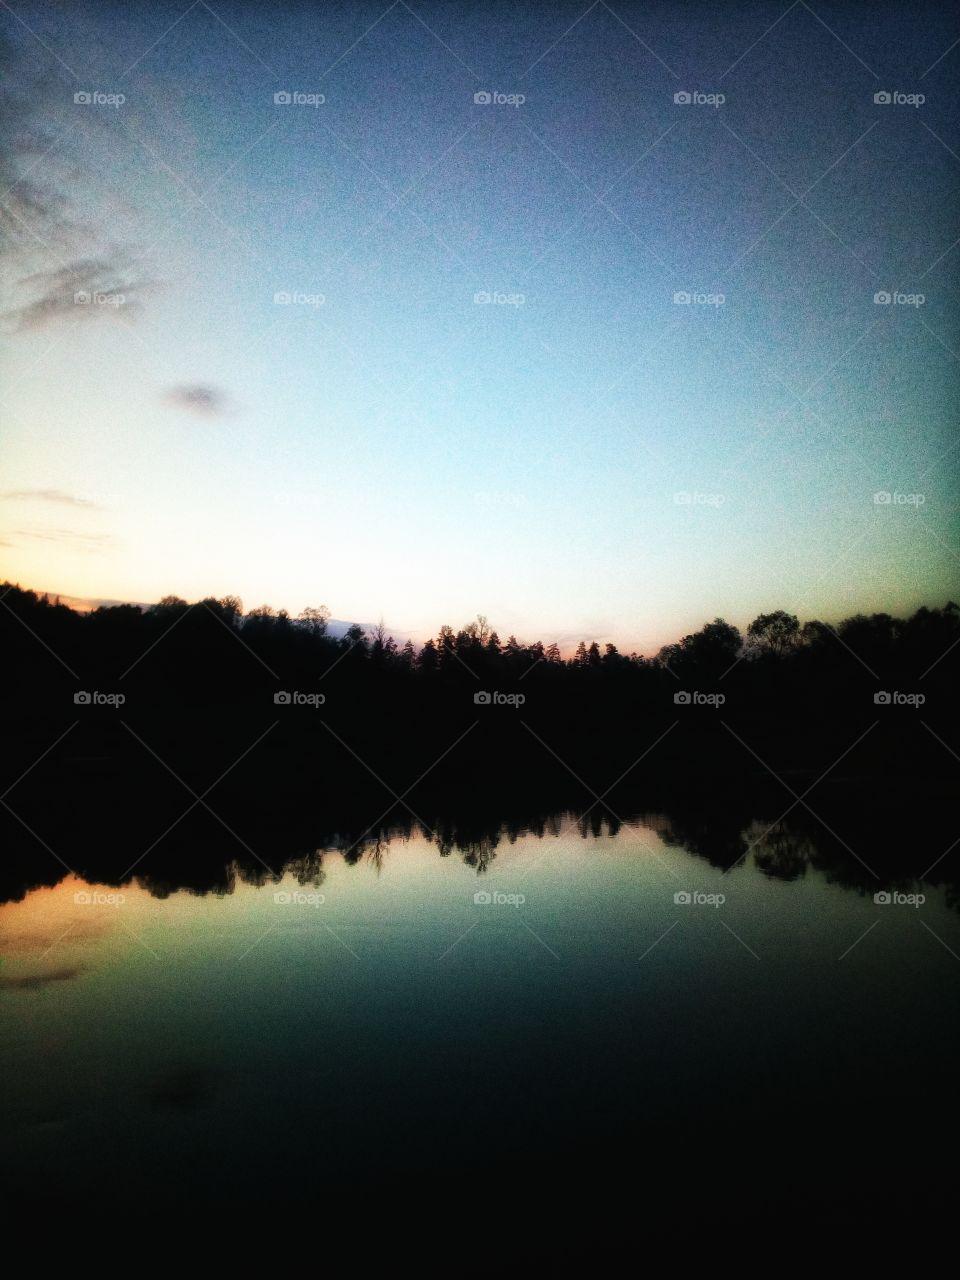 Evening. Summertime. River.